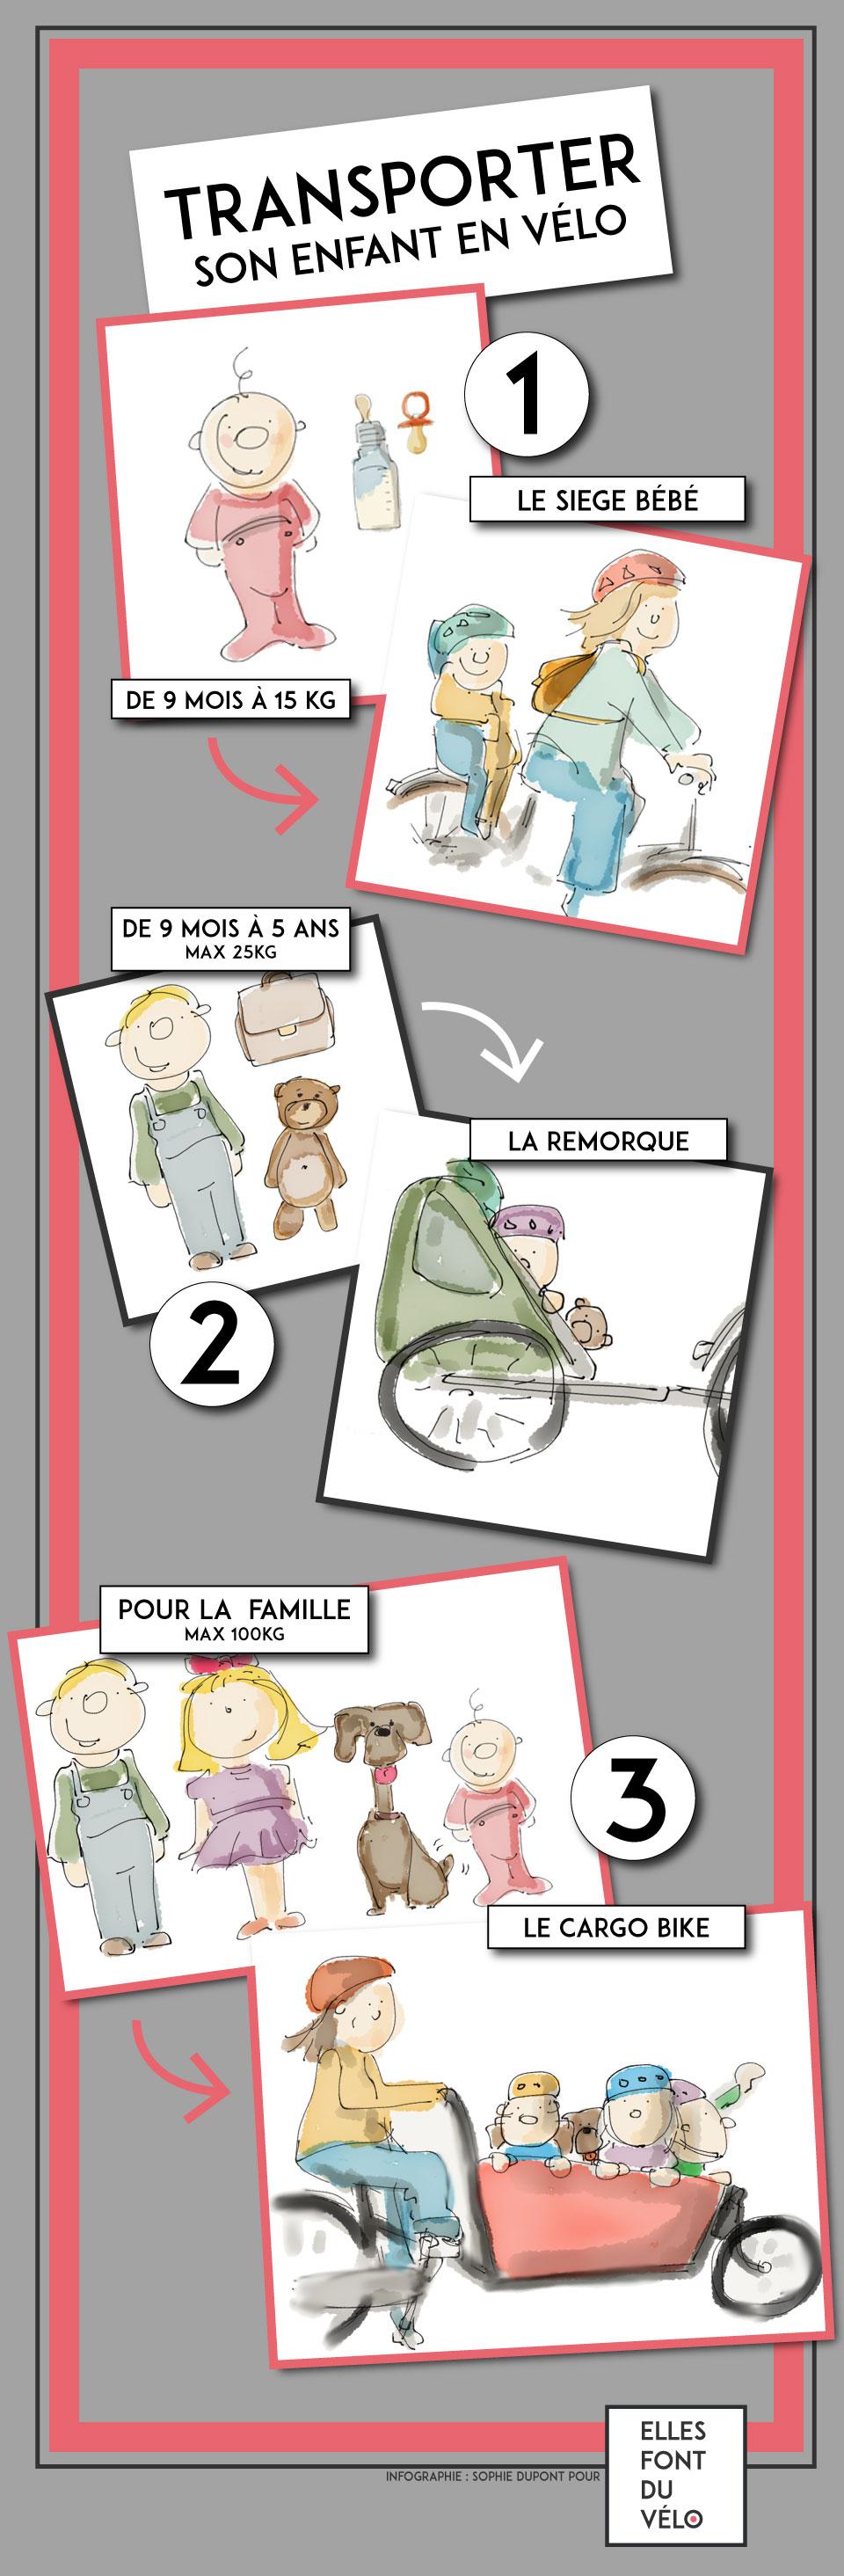 Transporter son enfant en vélo